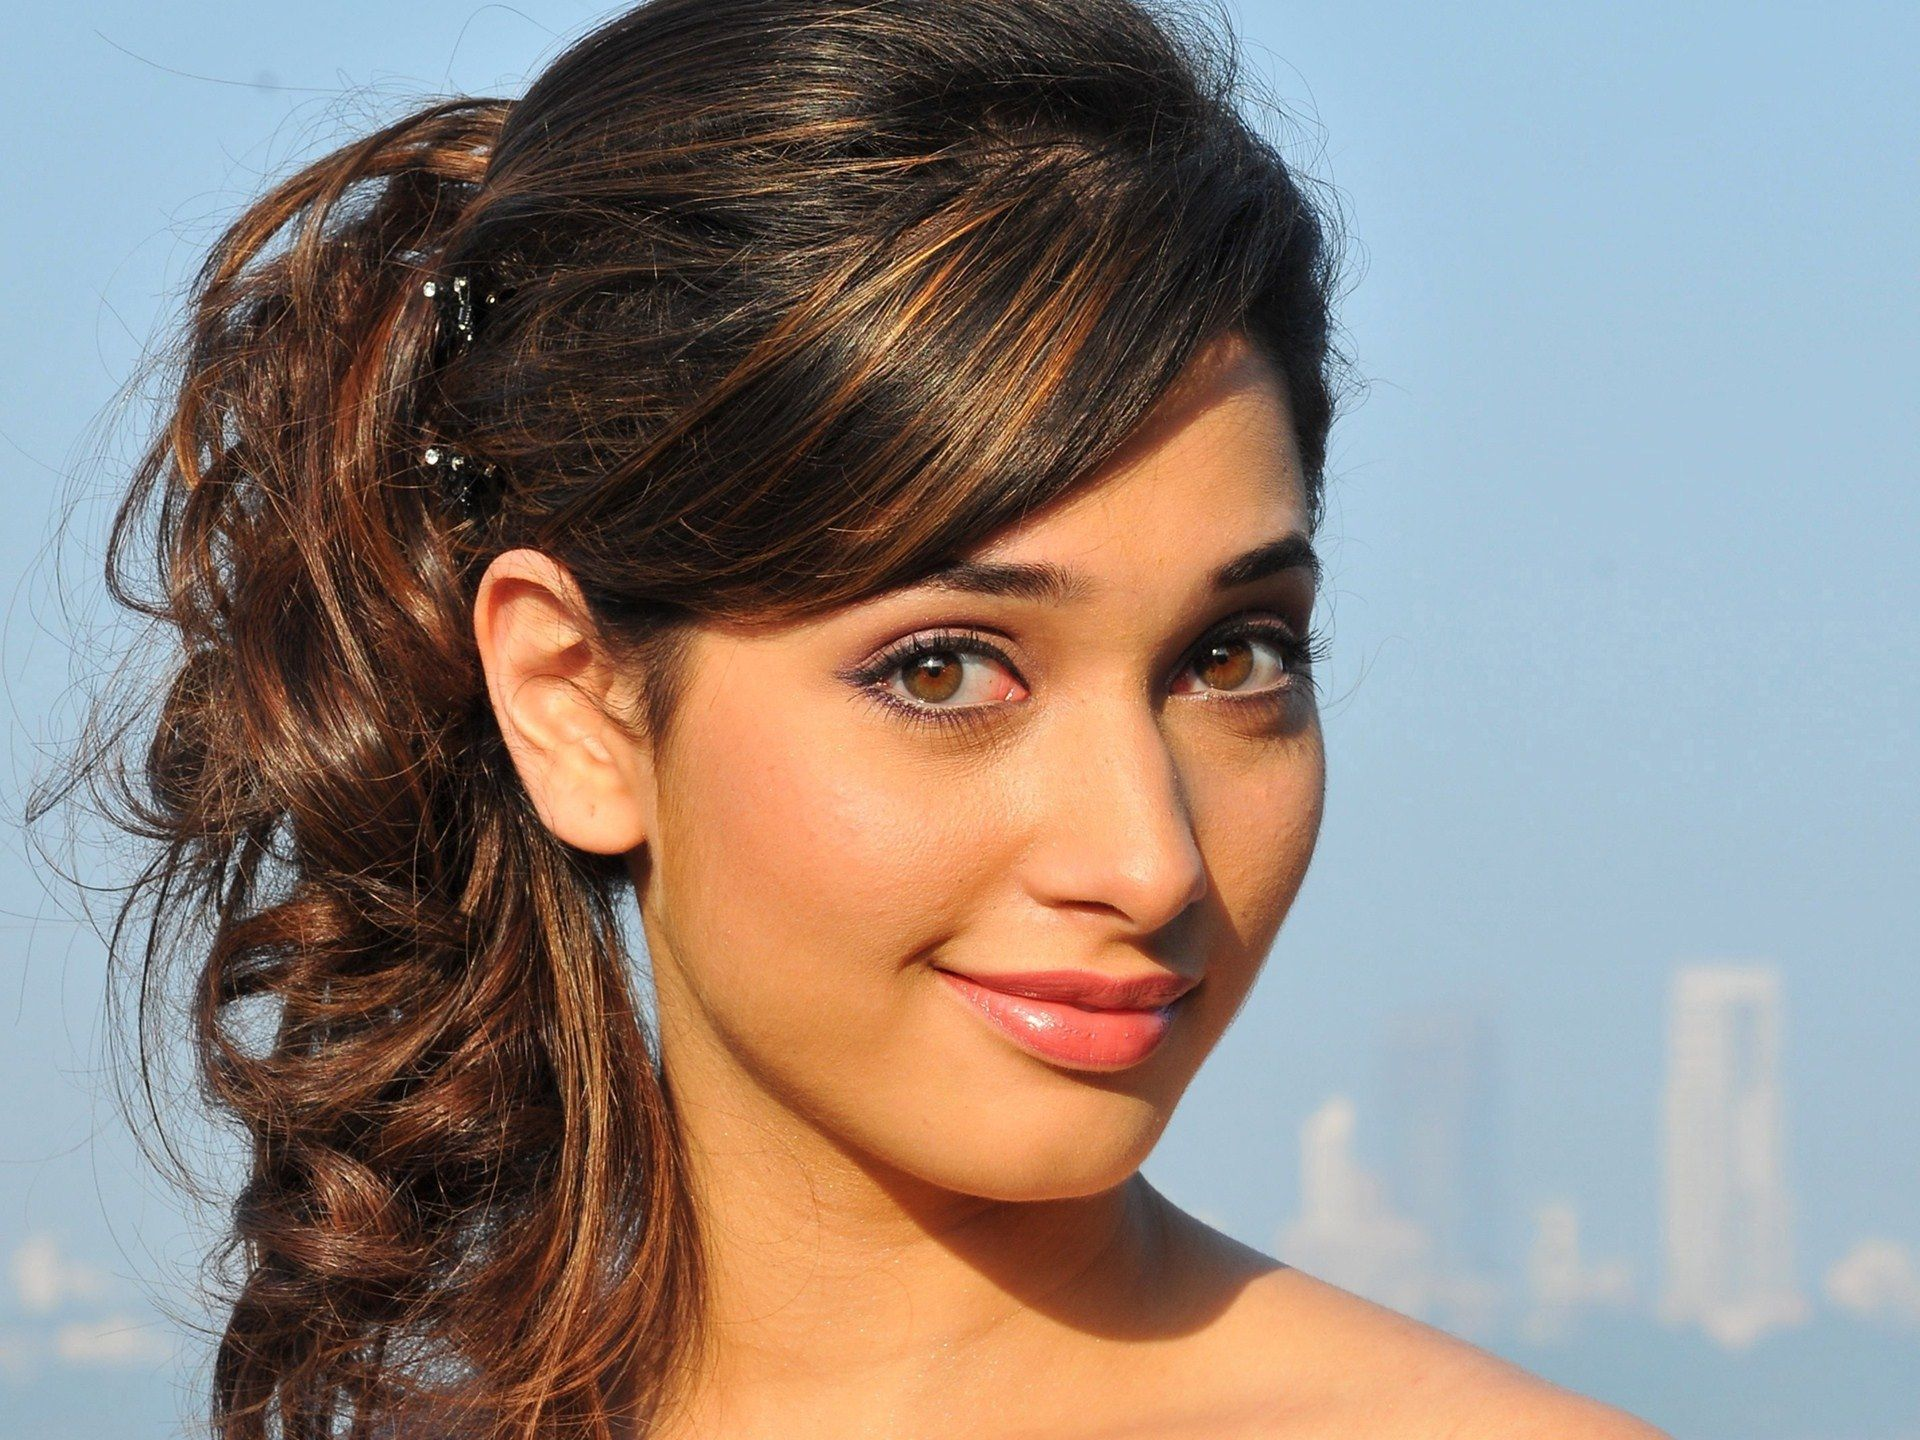 Tamanna Latest: Tamanna Bhatia Wallpapers Hd Smile Cute